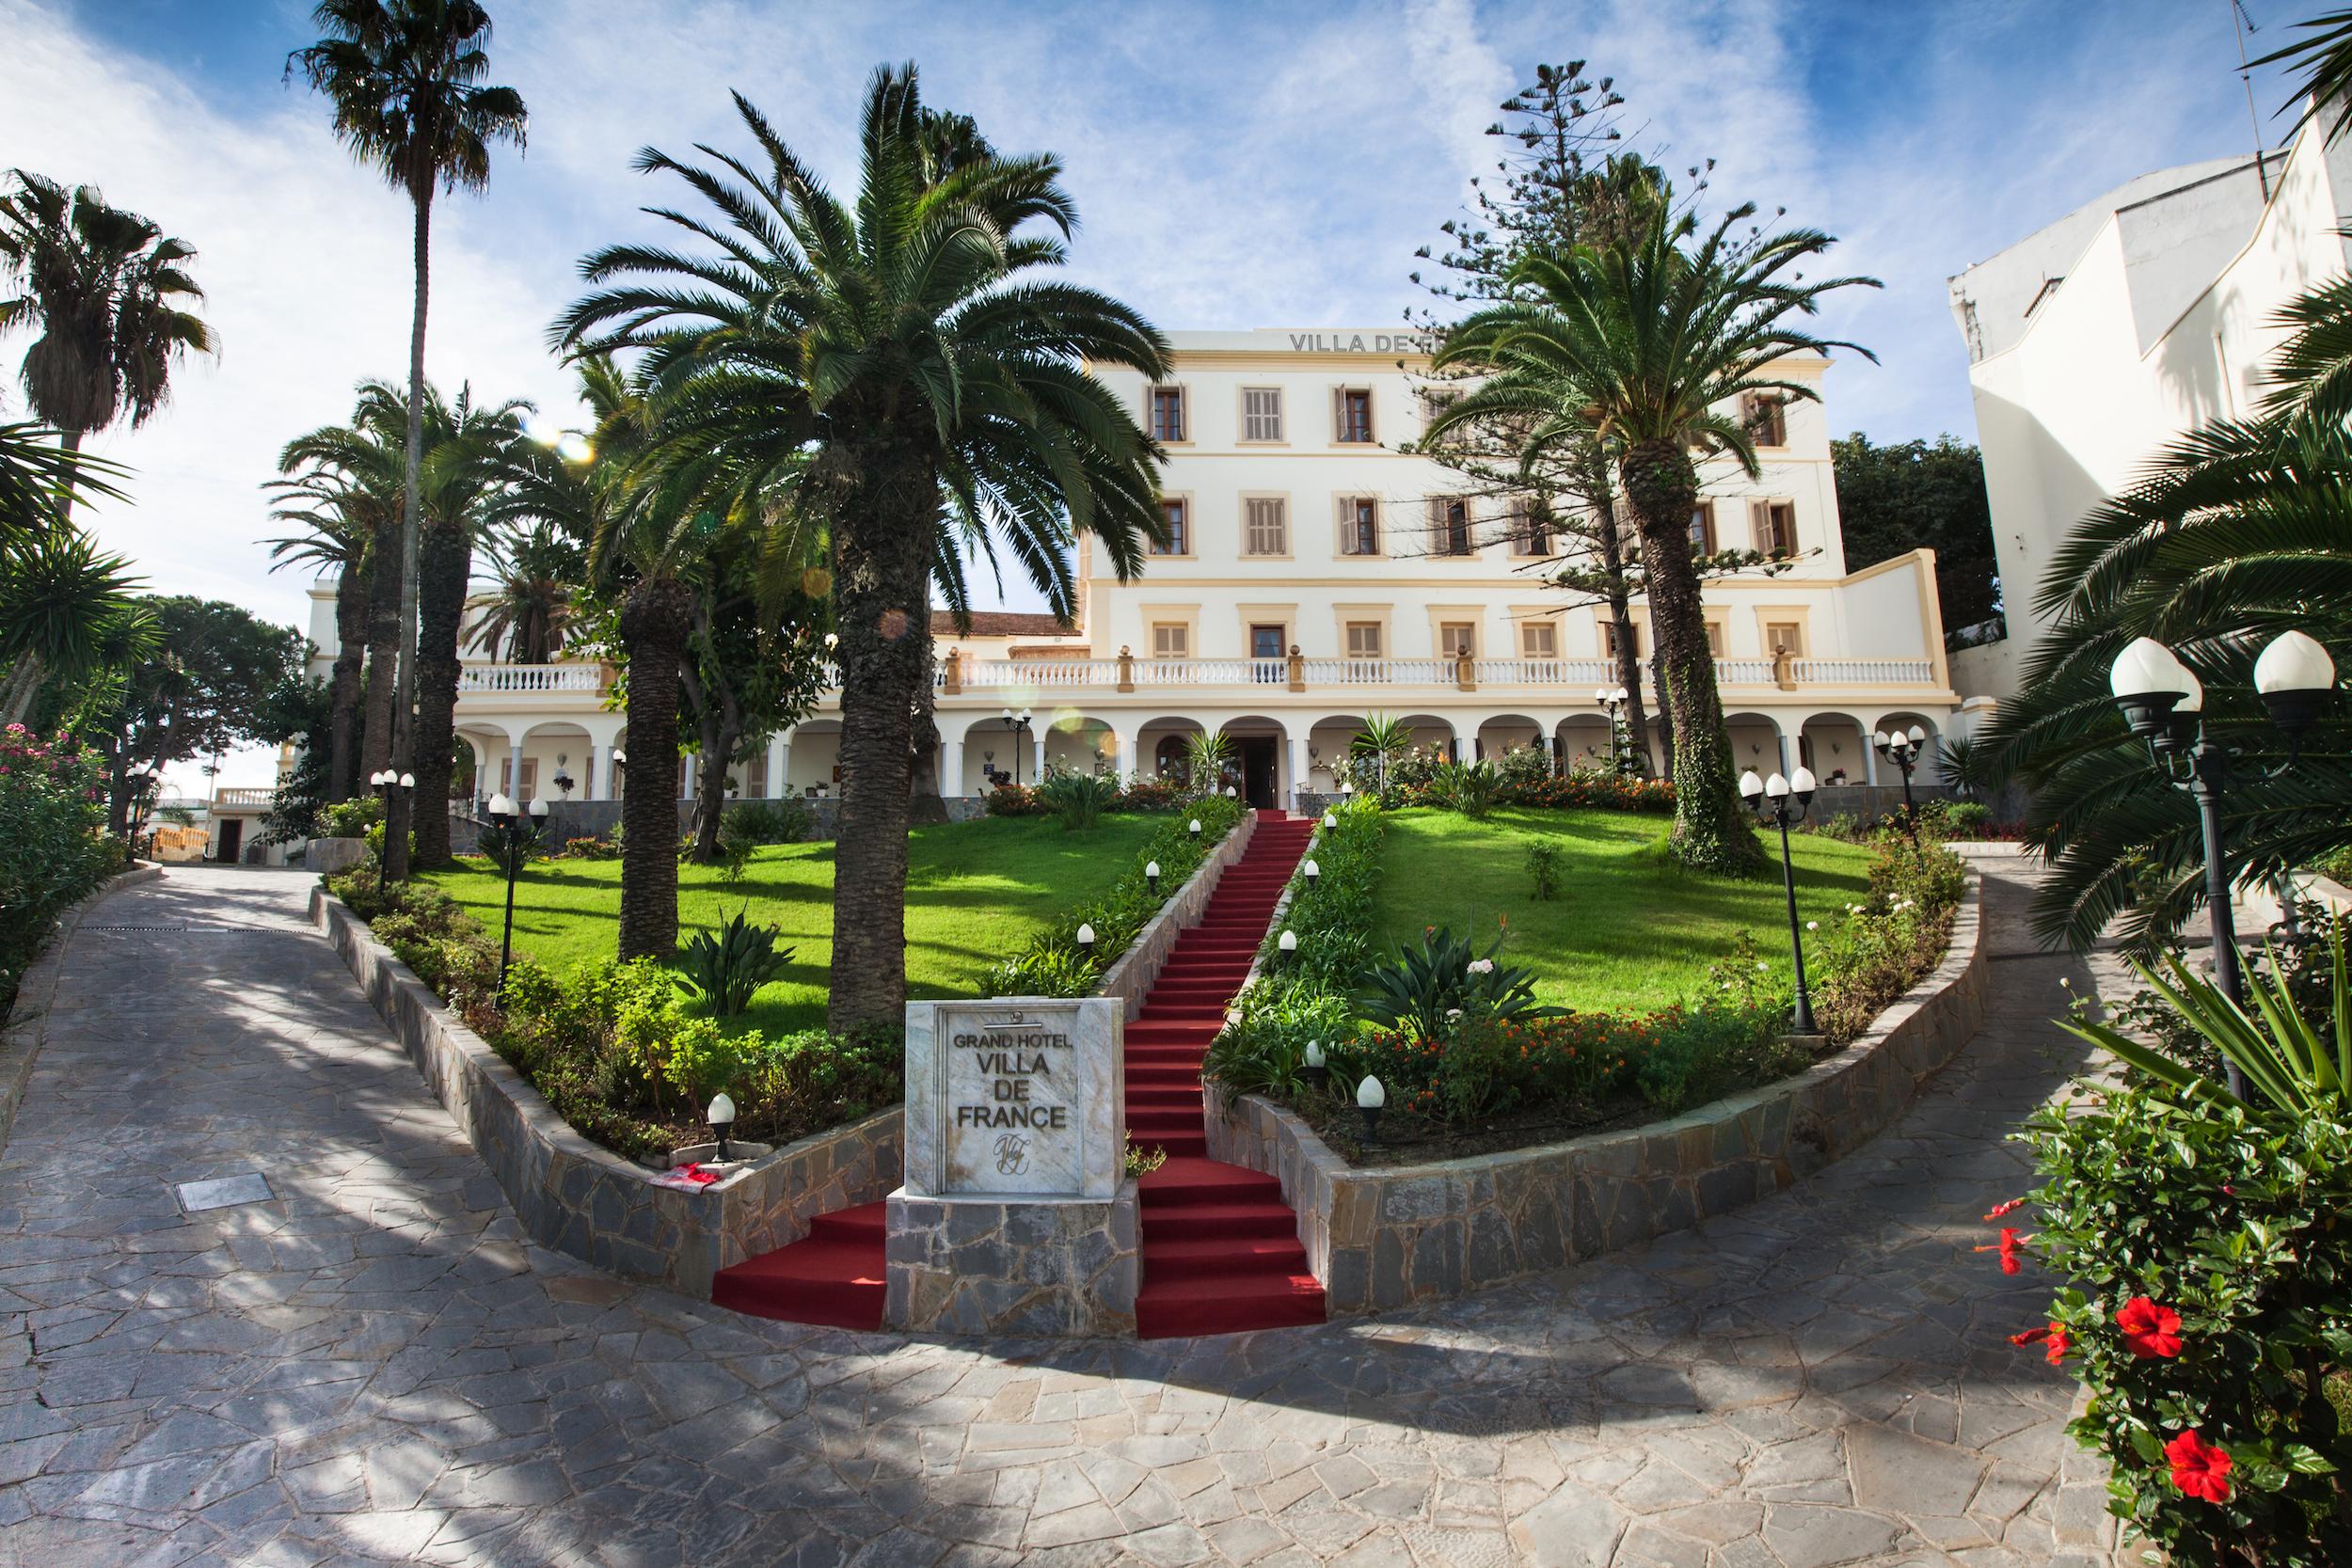 Grand Hotel Villa de France Tangier